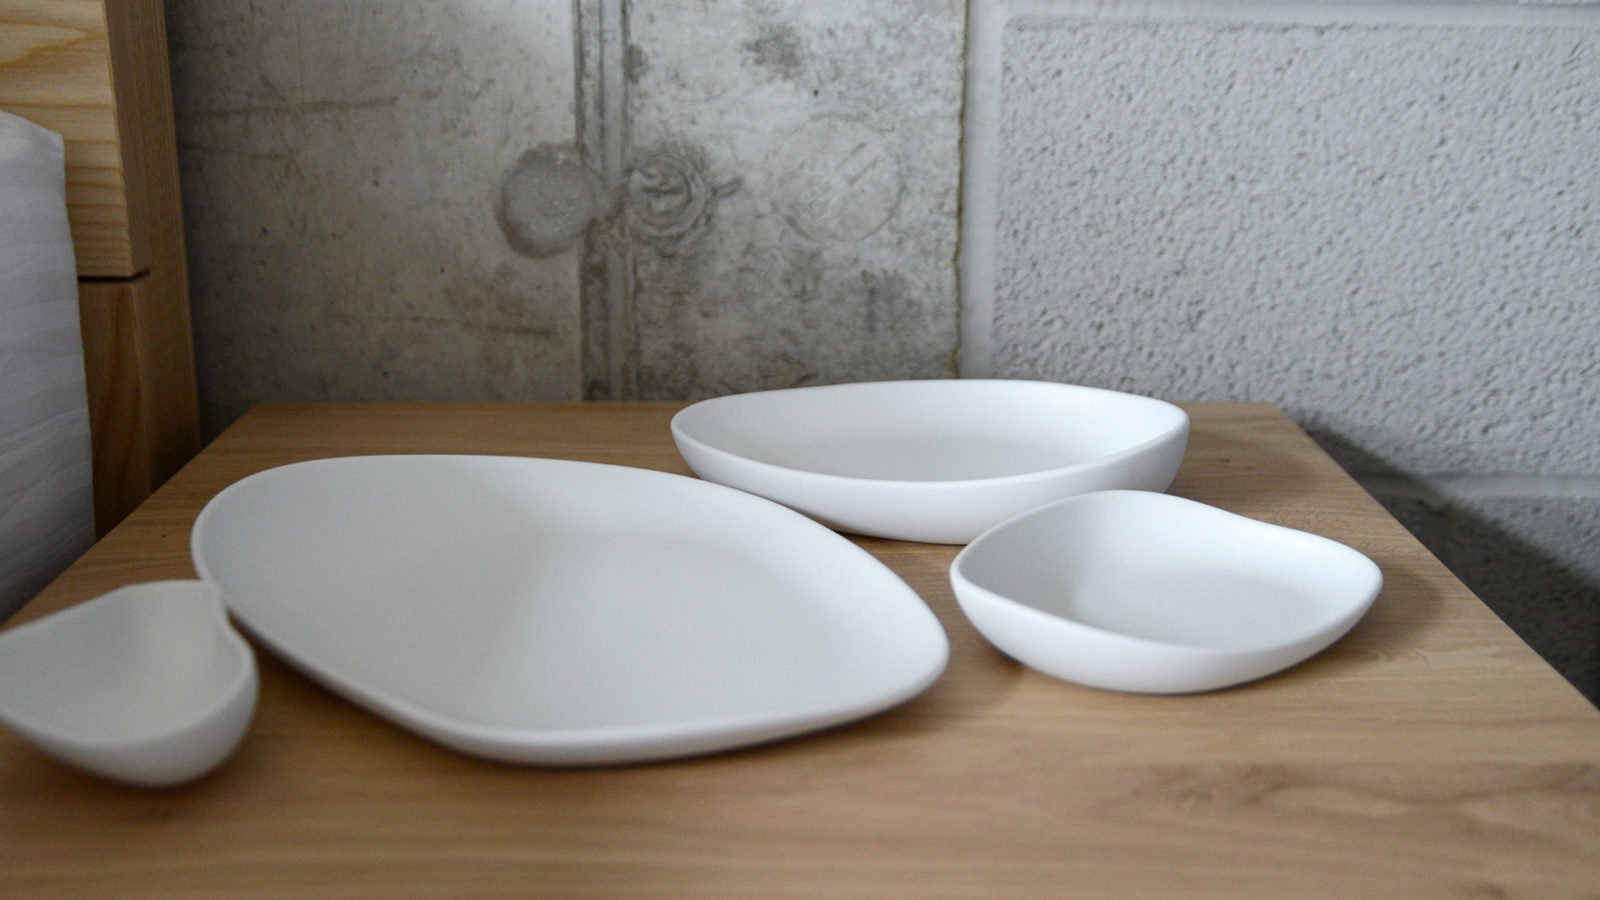 a set of matte white porcelain dishes